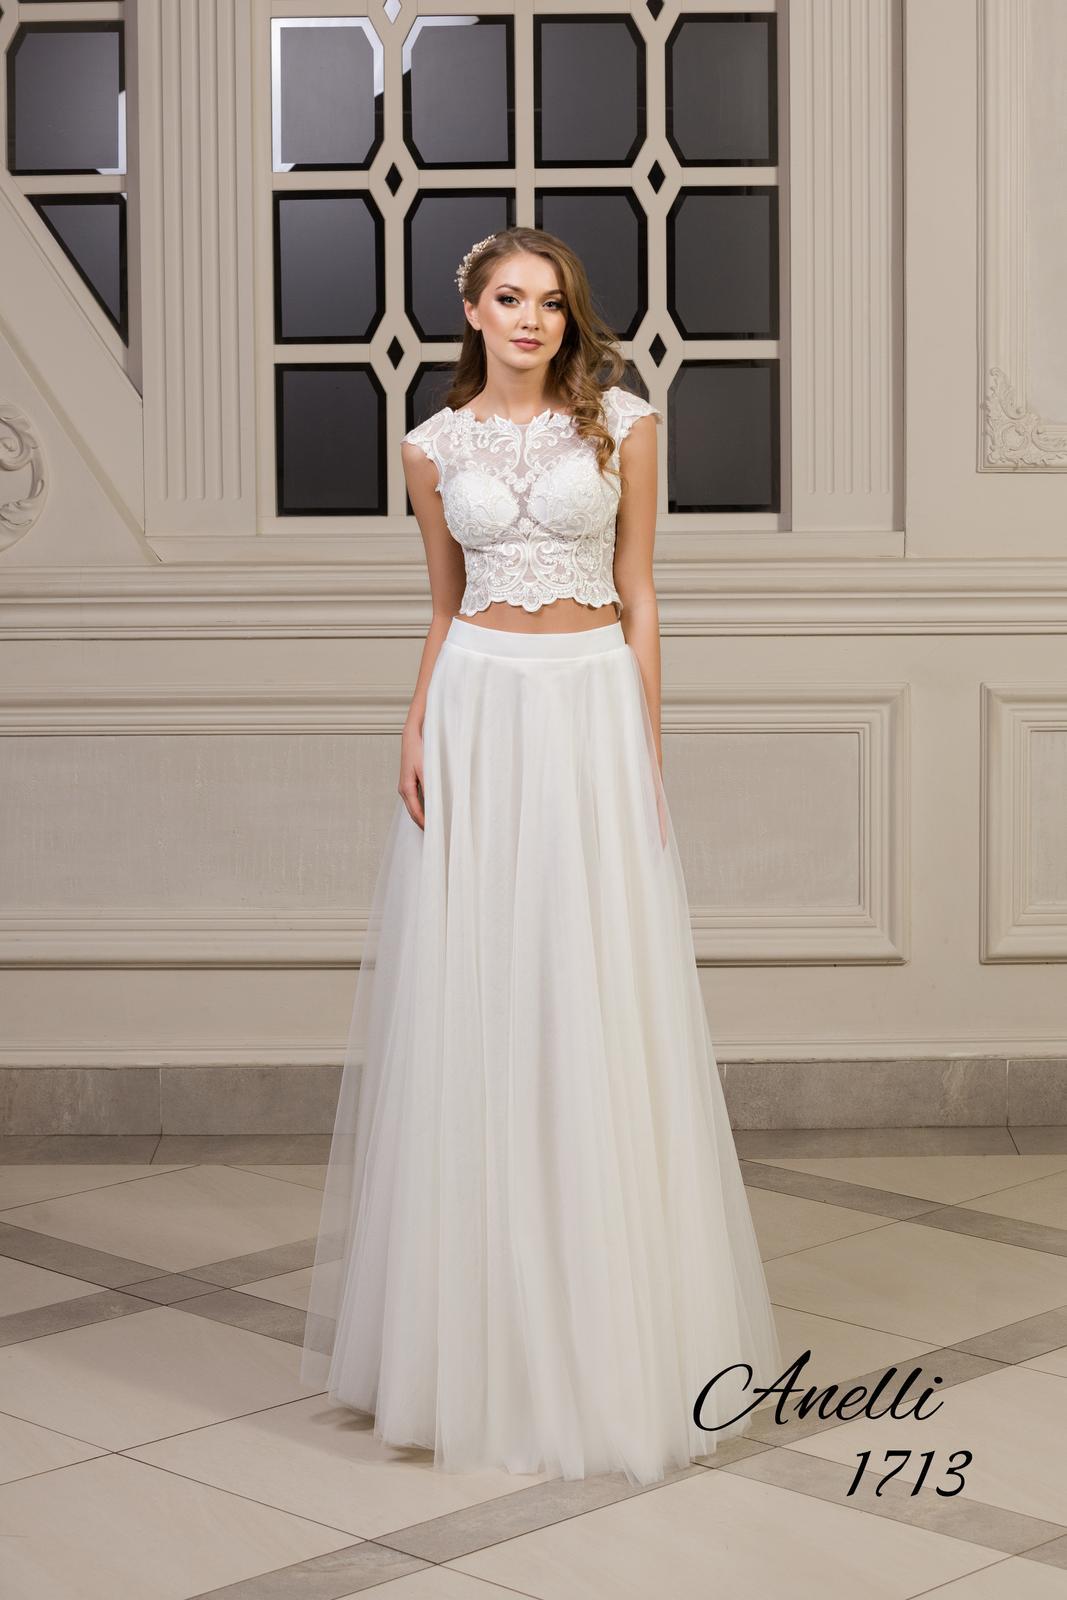 Svadobné šaty - Debut 1713 - Obrázok č. 3